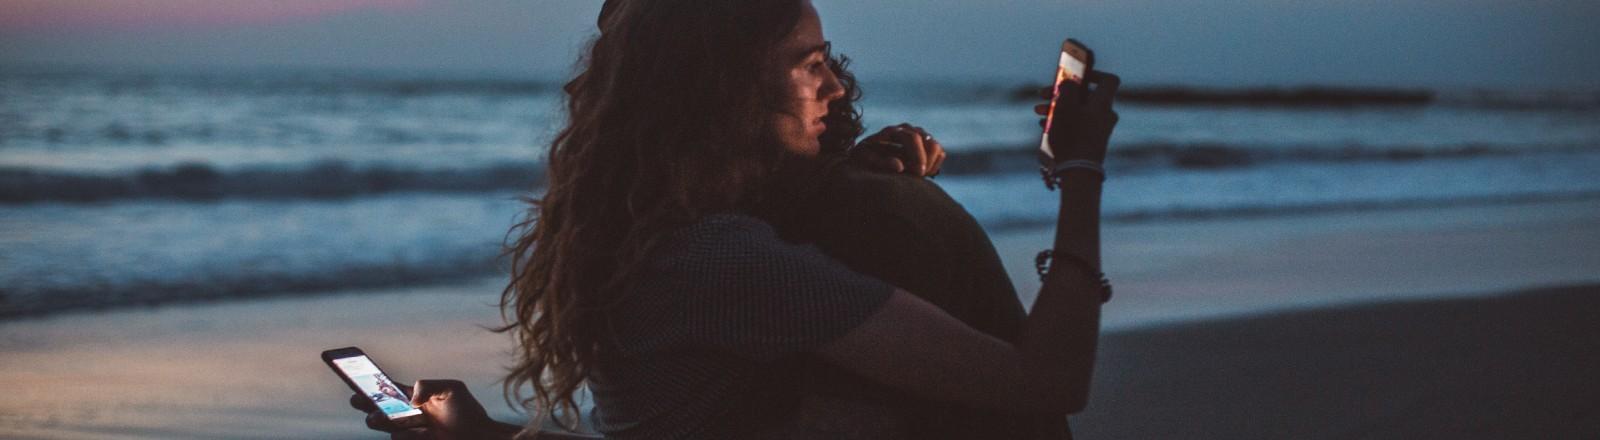 Paar am Strand mit Smartphones